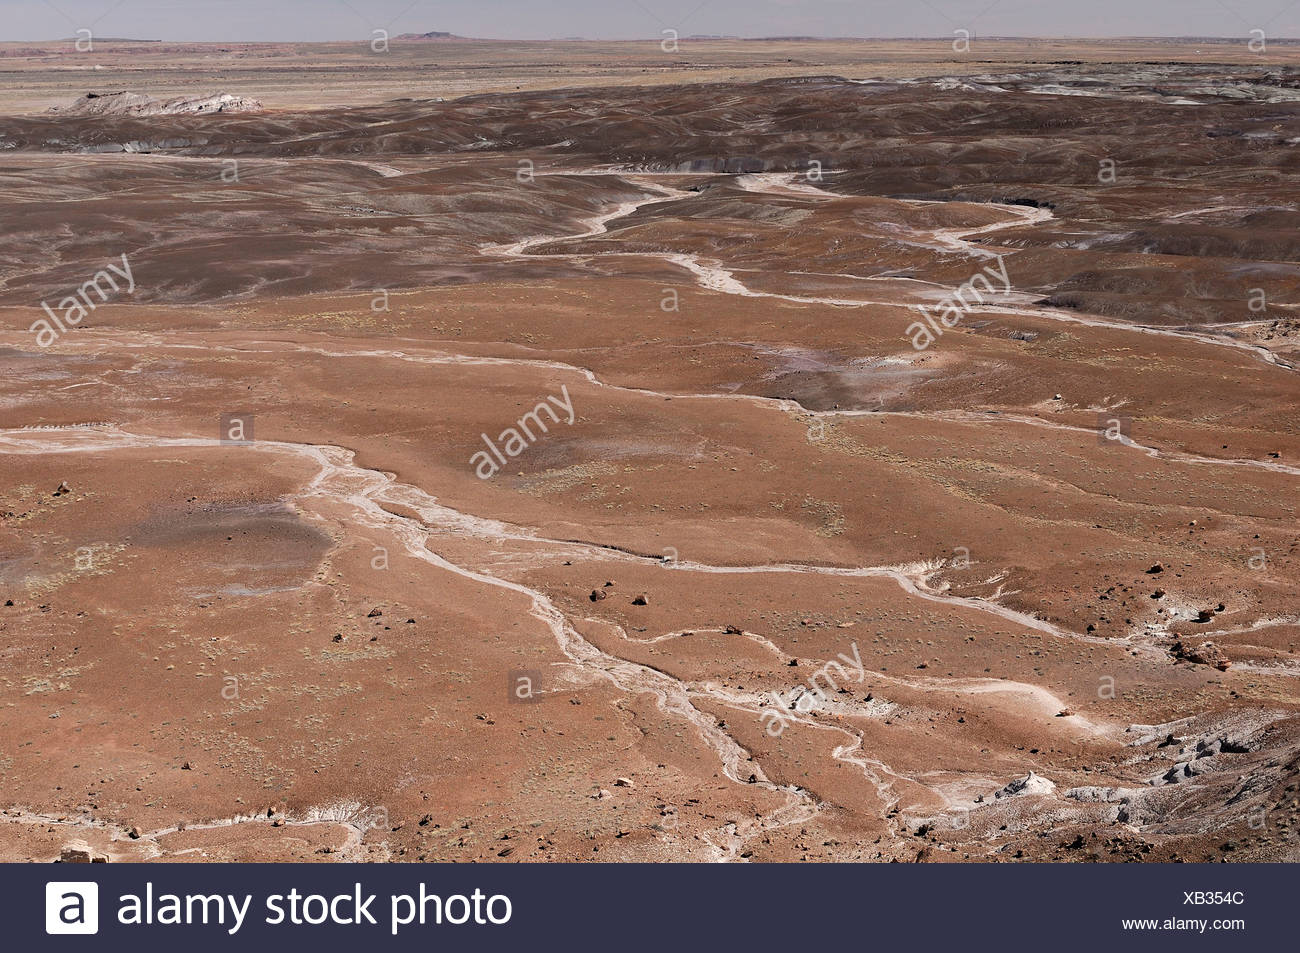 Petrified Forest, National Park, Arizona, USA, United States, America, landscape, brown - Stock Image